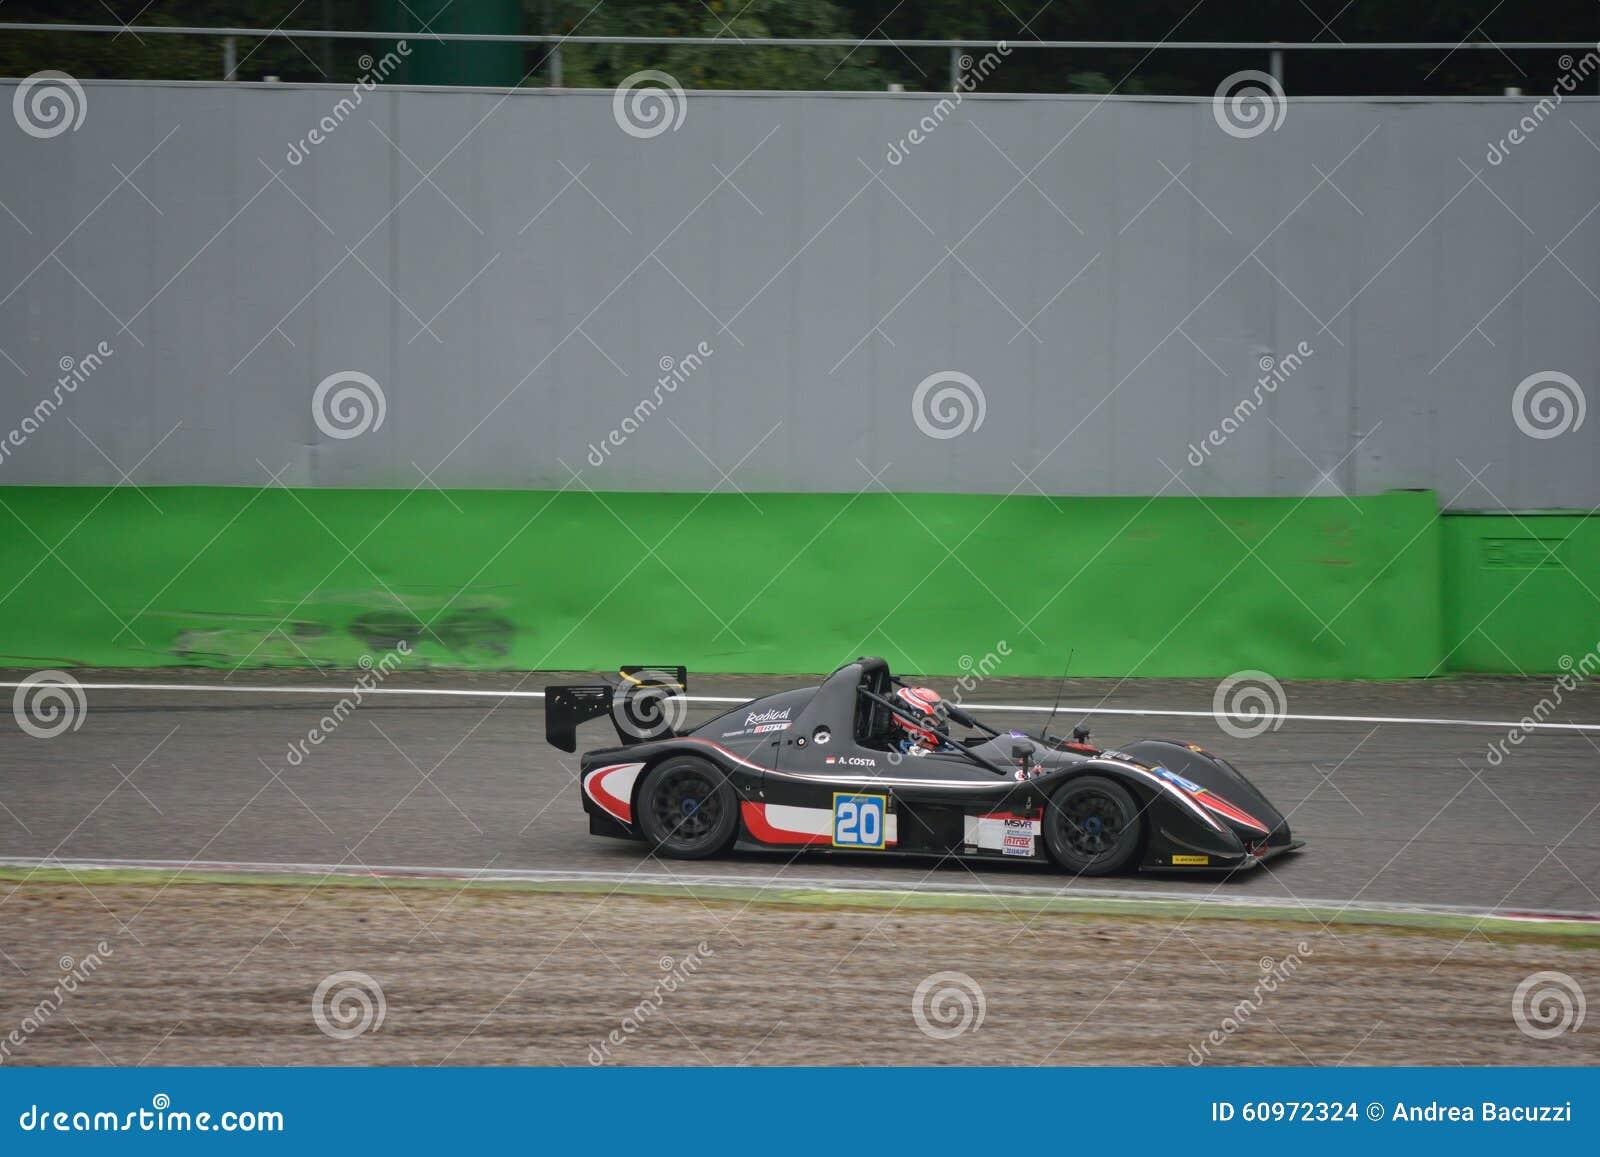 Radical SR8 Car Racing At Monza Editorial Stock Image - Image of